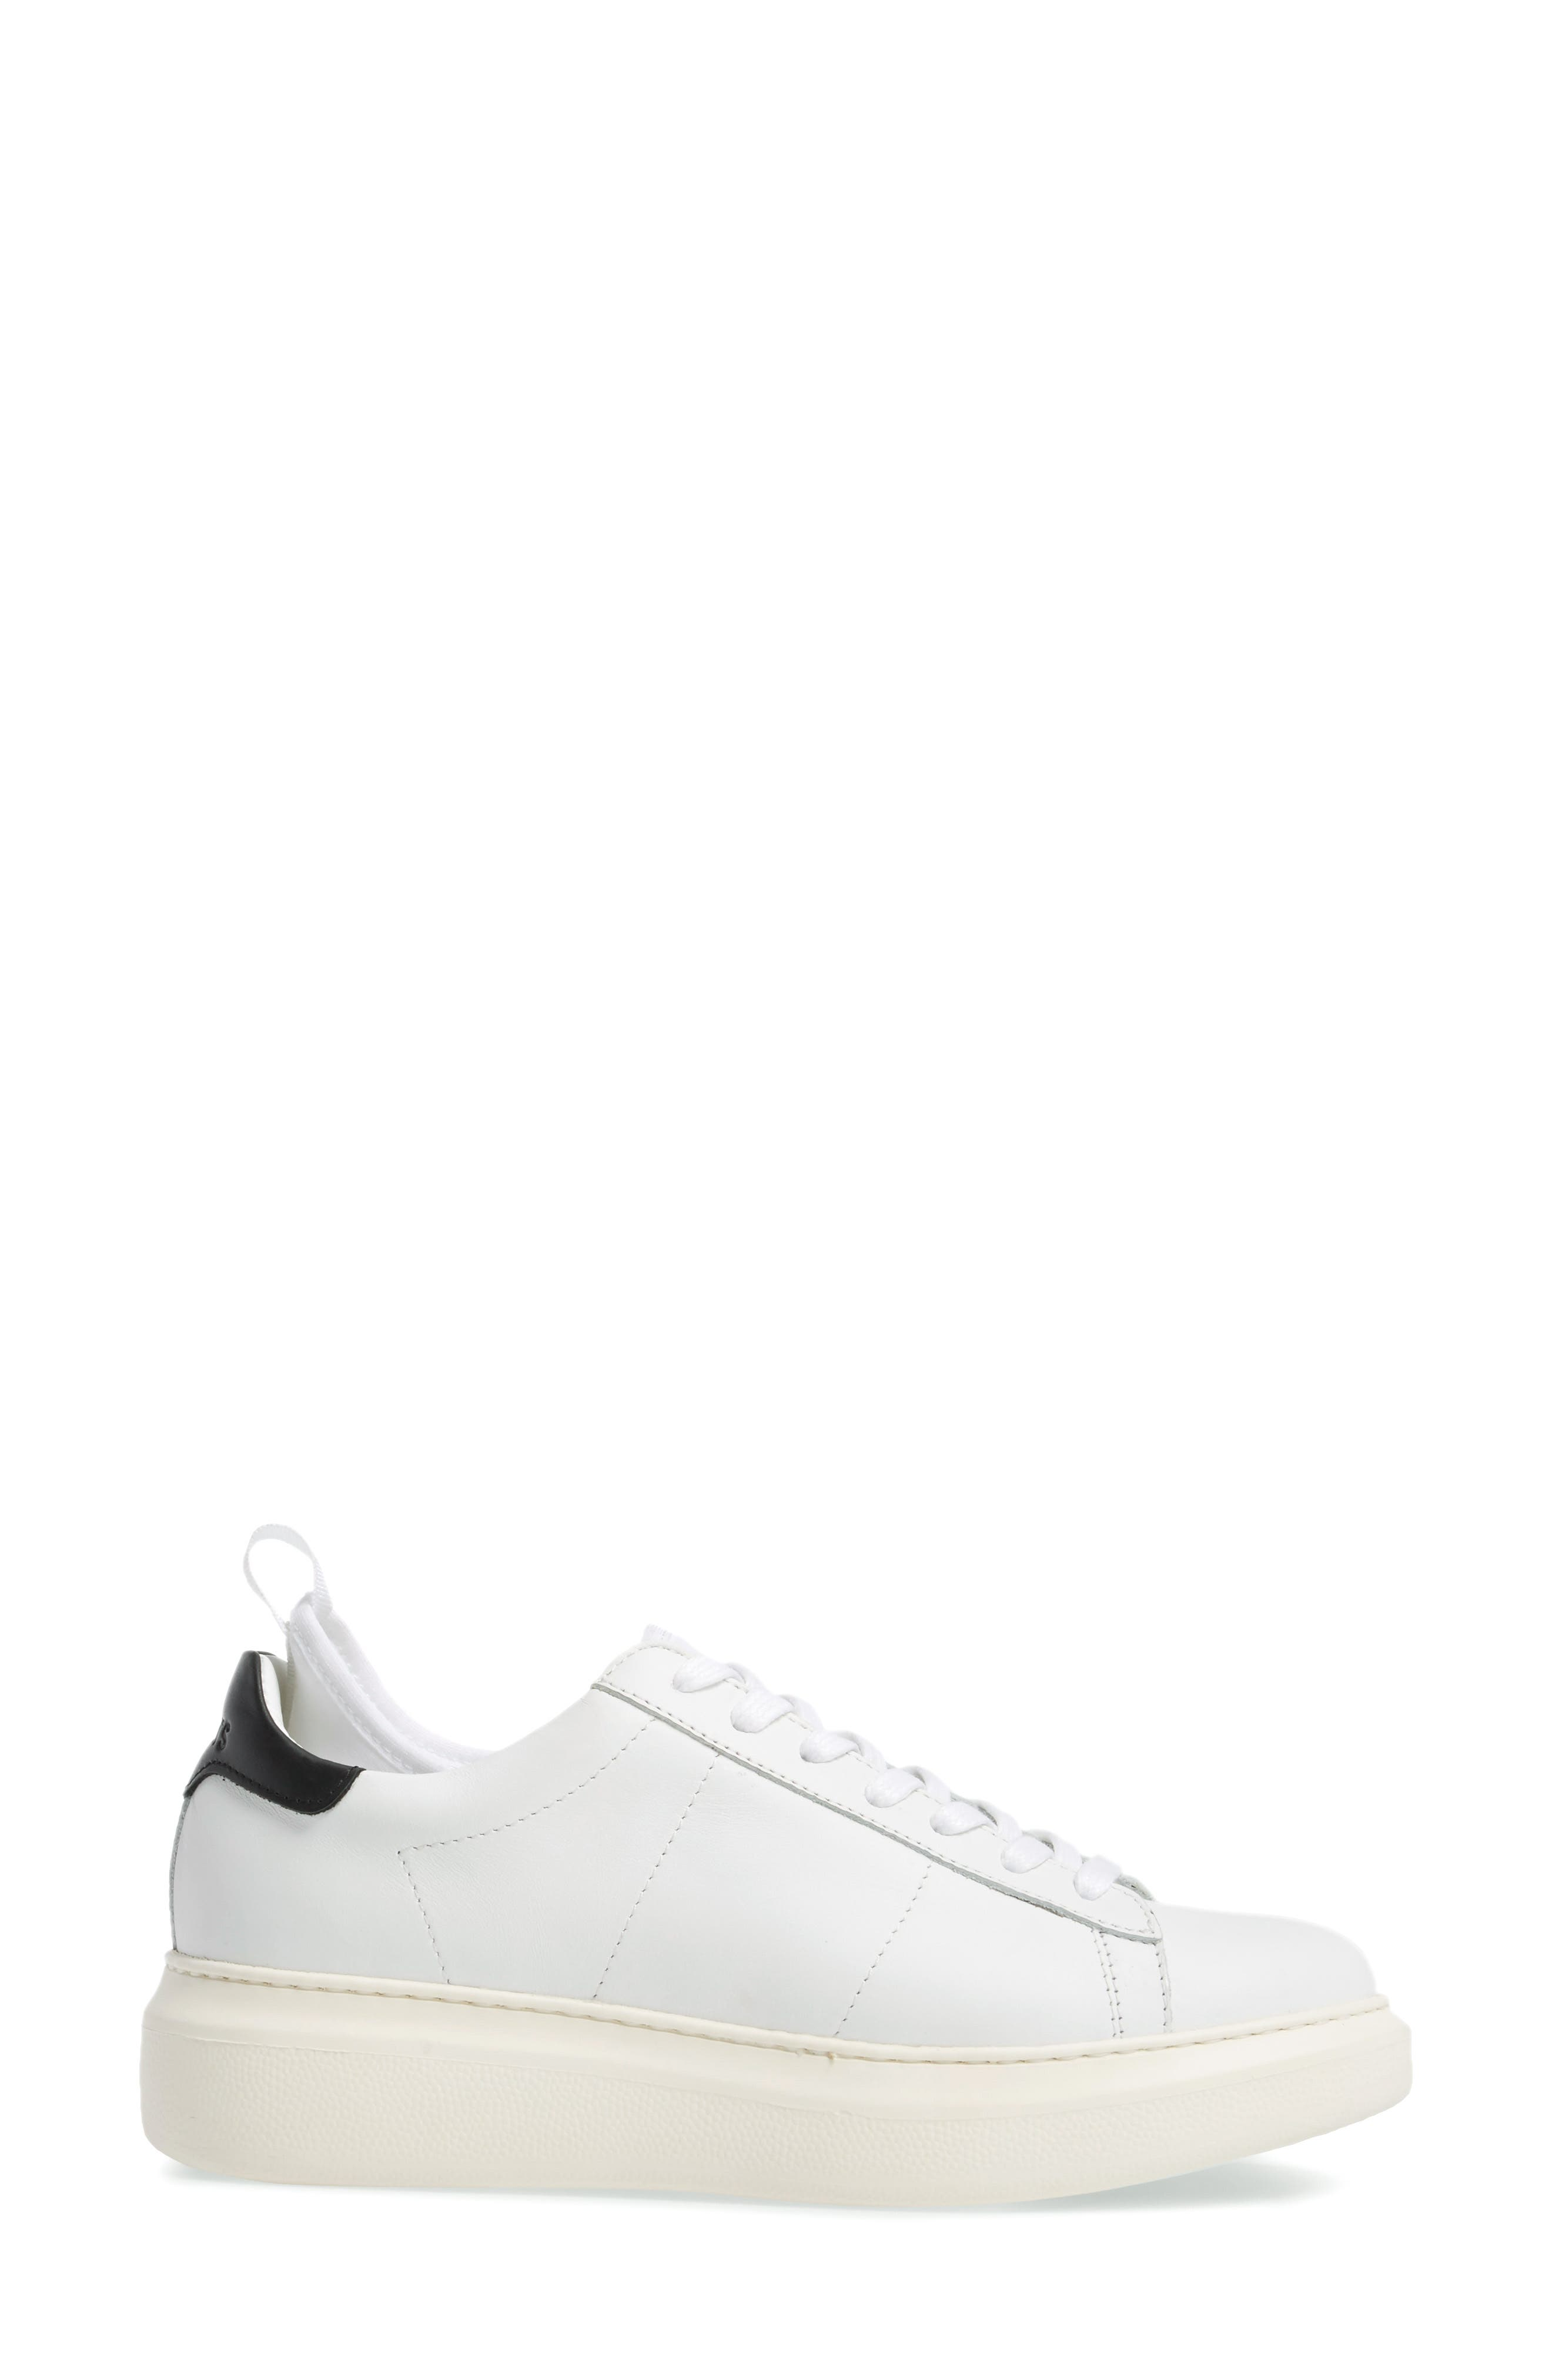 Alternate Image 3  - Greats Alta Low Top Sneaker (Women)